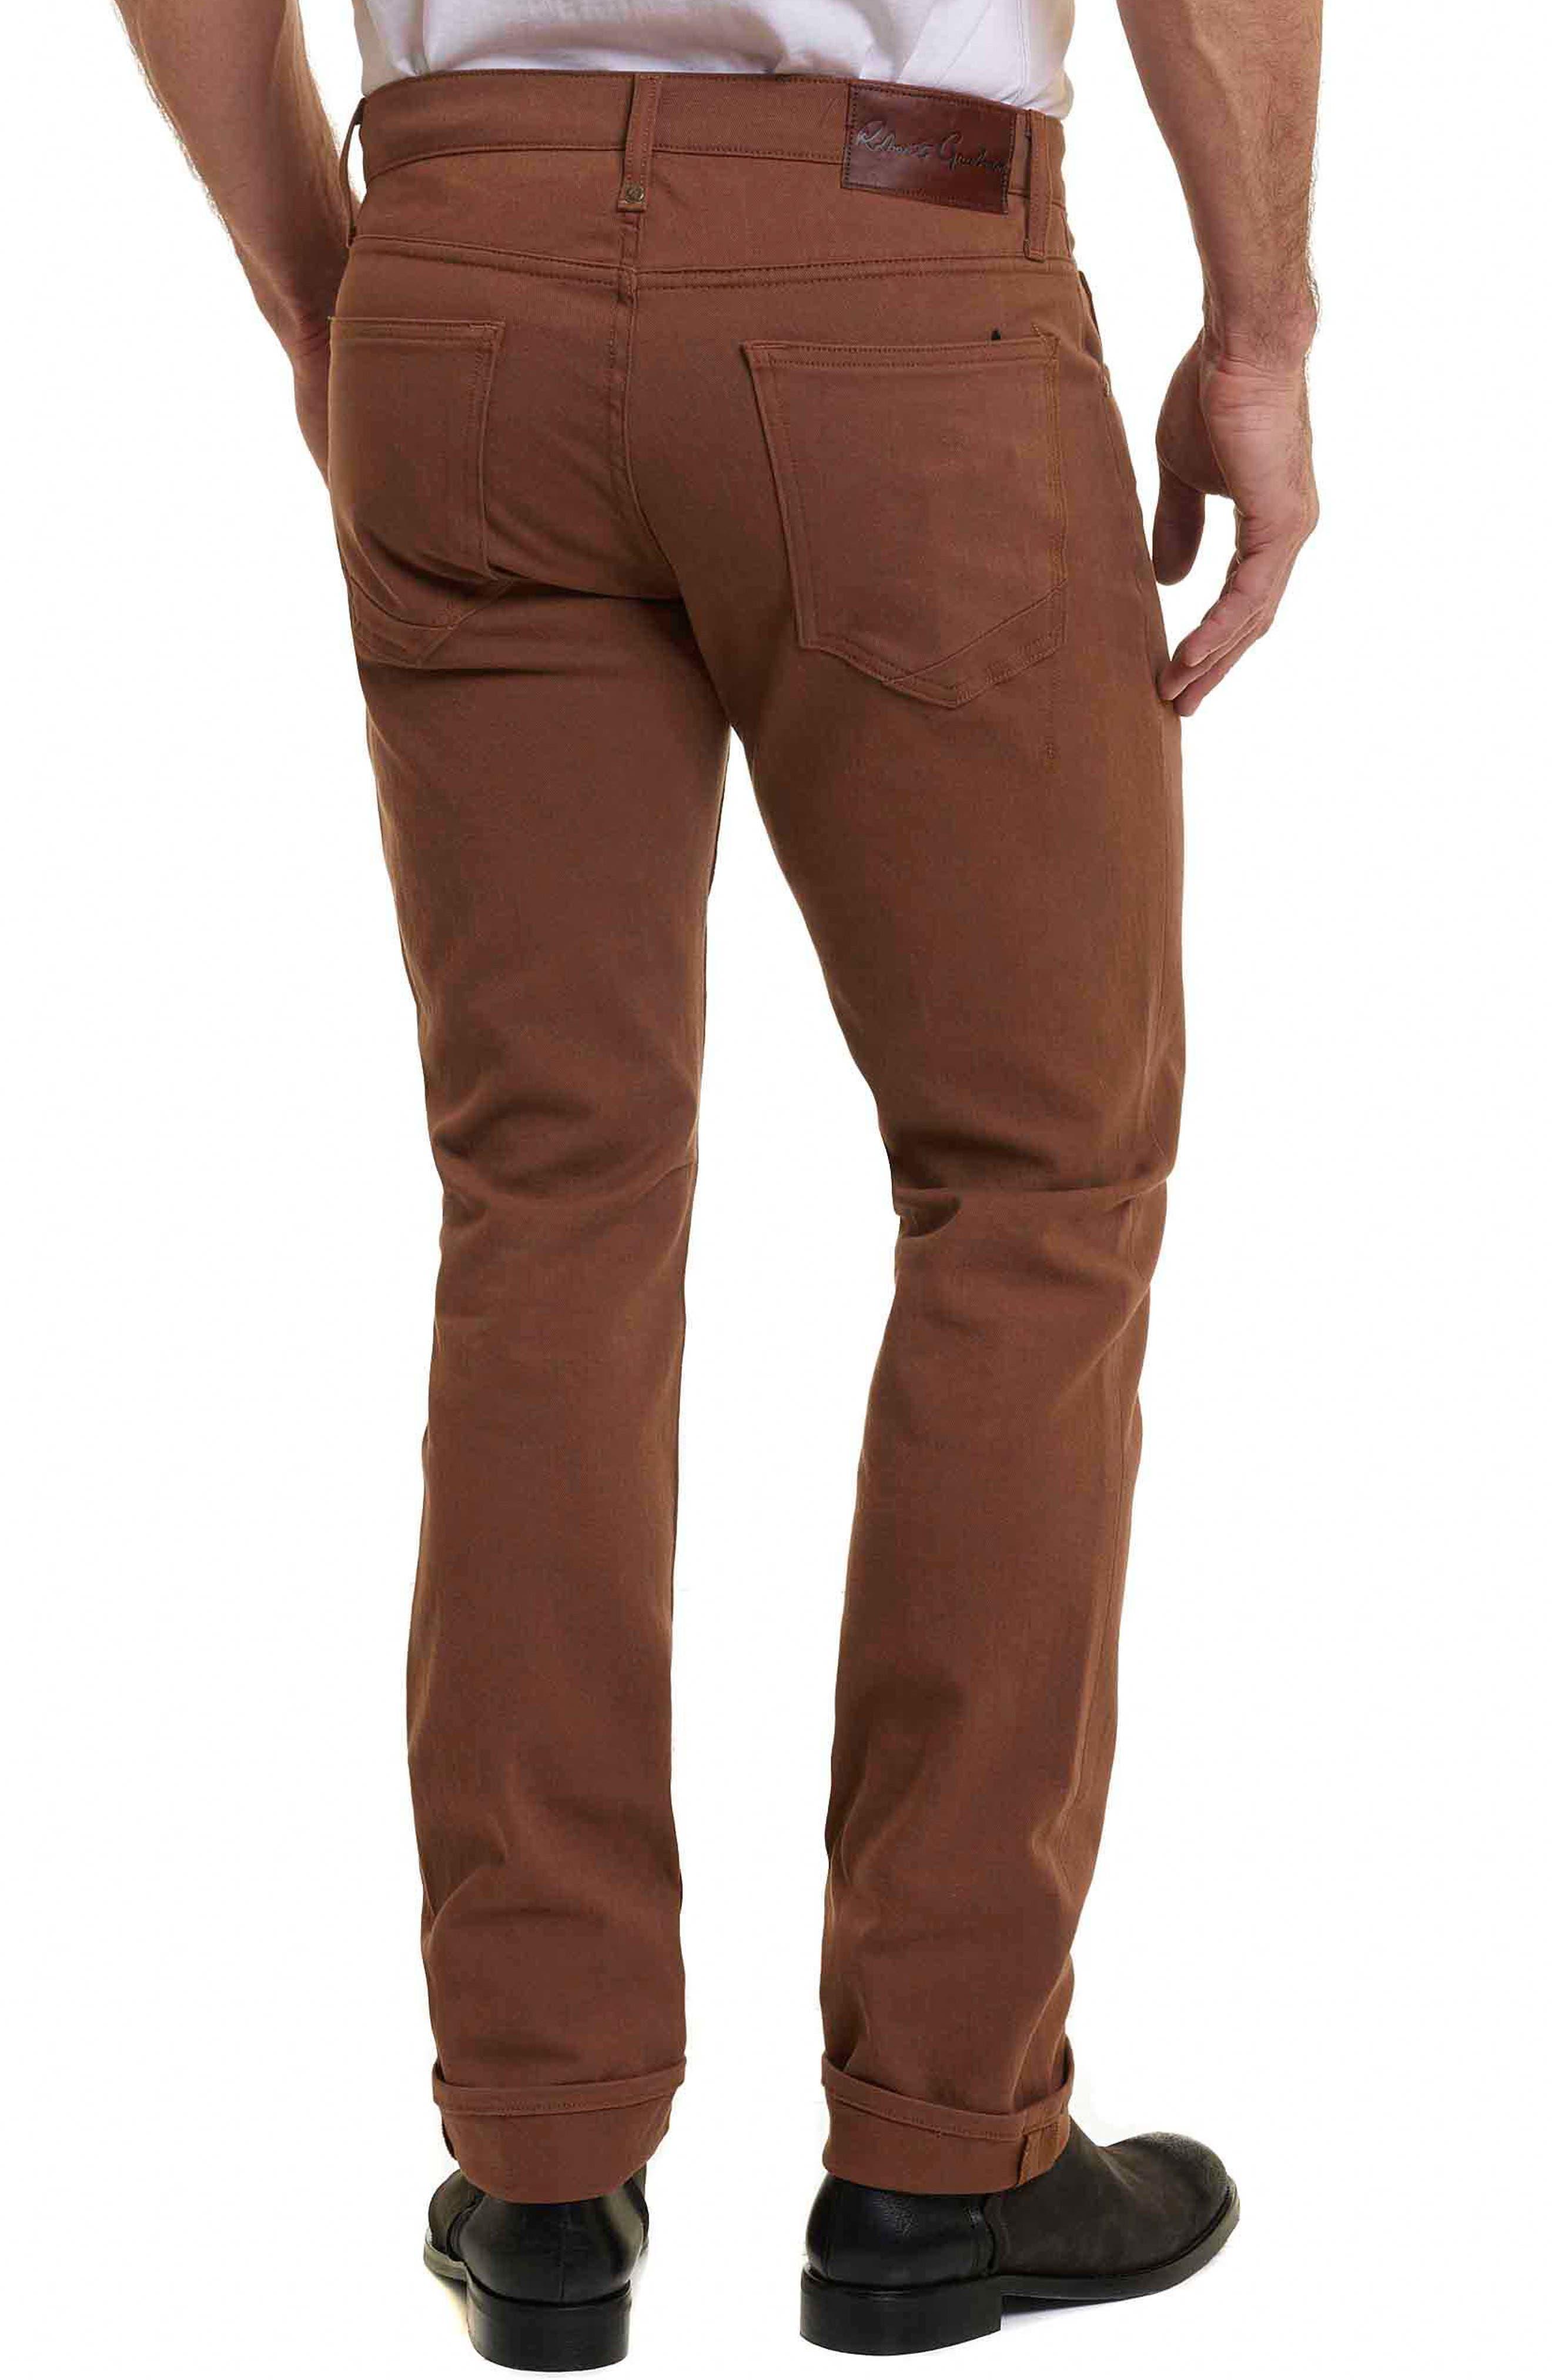 Corwin Classic Fit Jeans,                             Alternate thumbnail 2, color,                             Copper